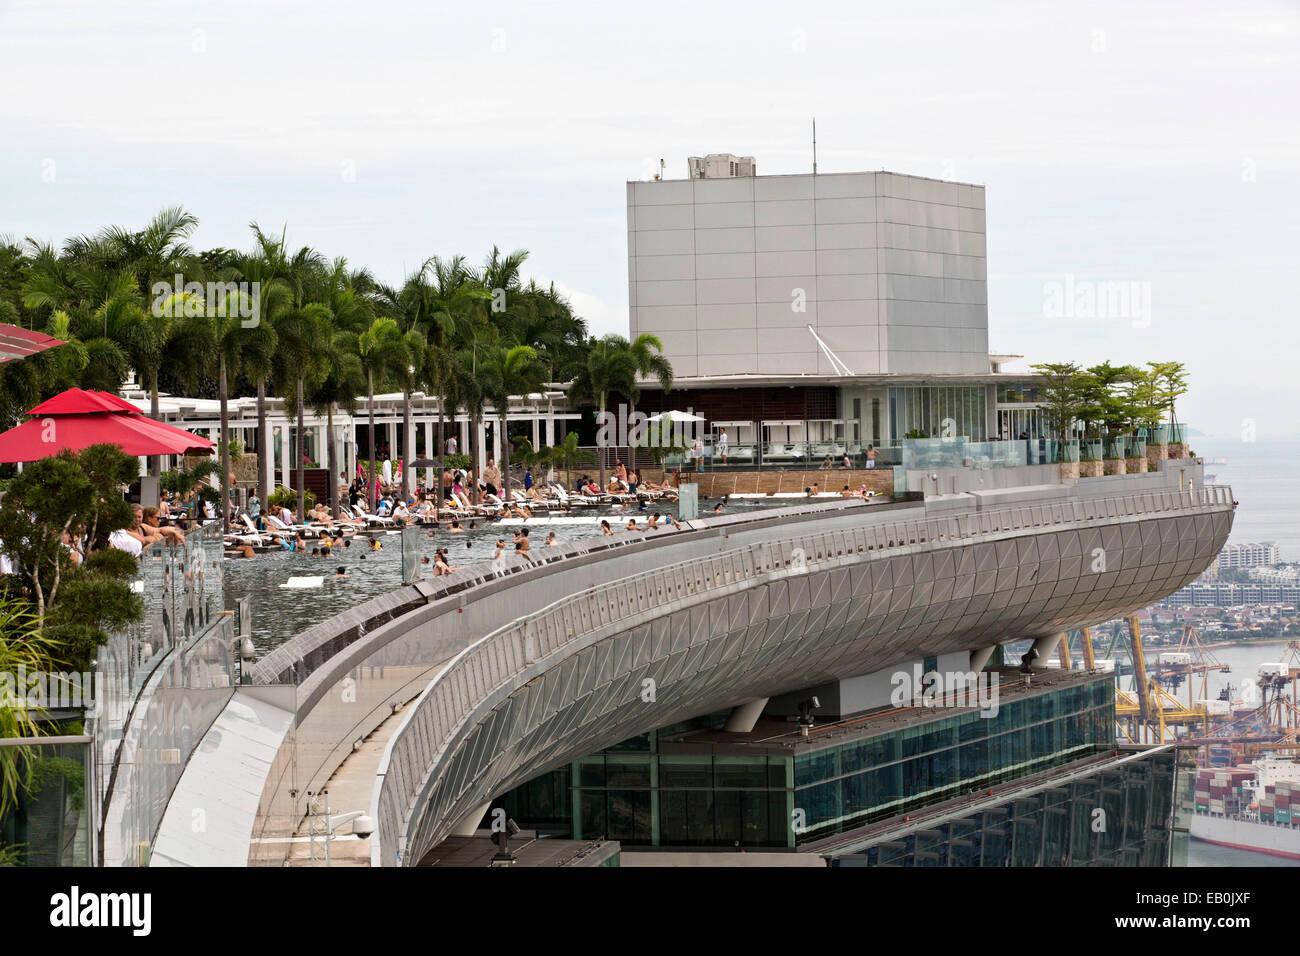 Singapore, said pool 'horizon' of the Marina Bay Sands hotel. - Stock Image